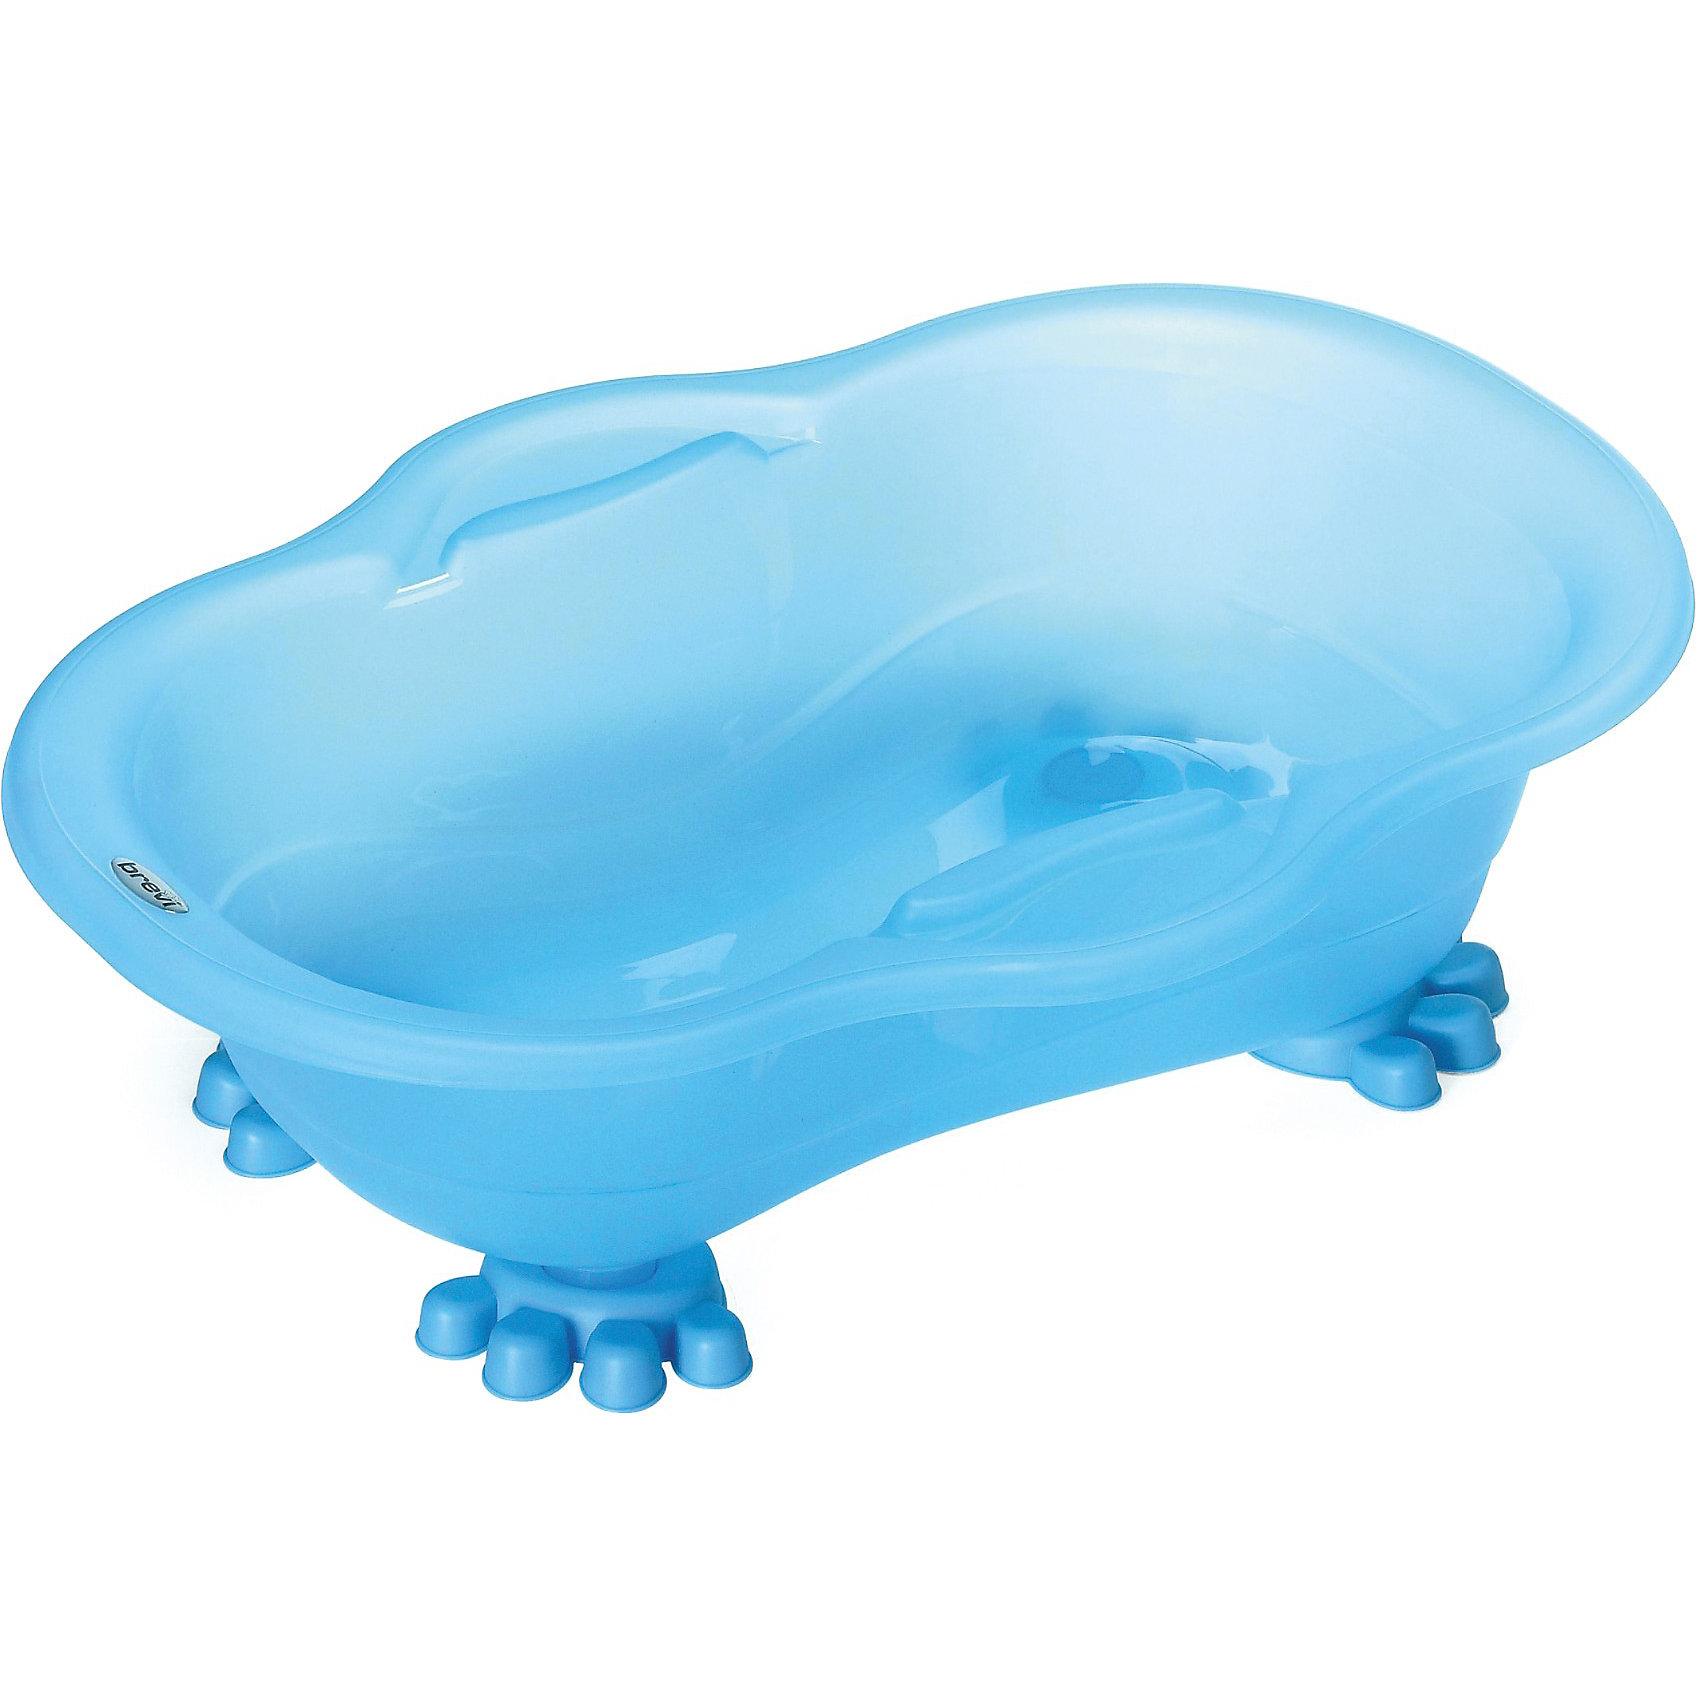 Ванночка для купания Dou Dou, Brevi,  синий